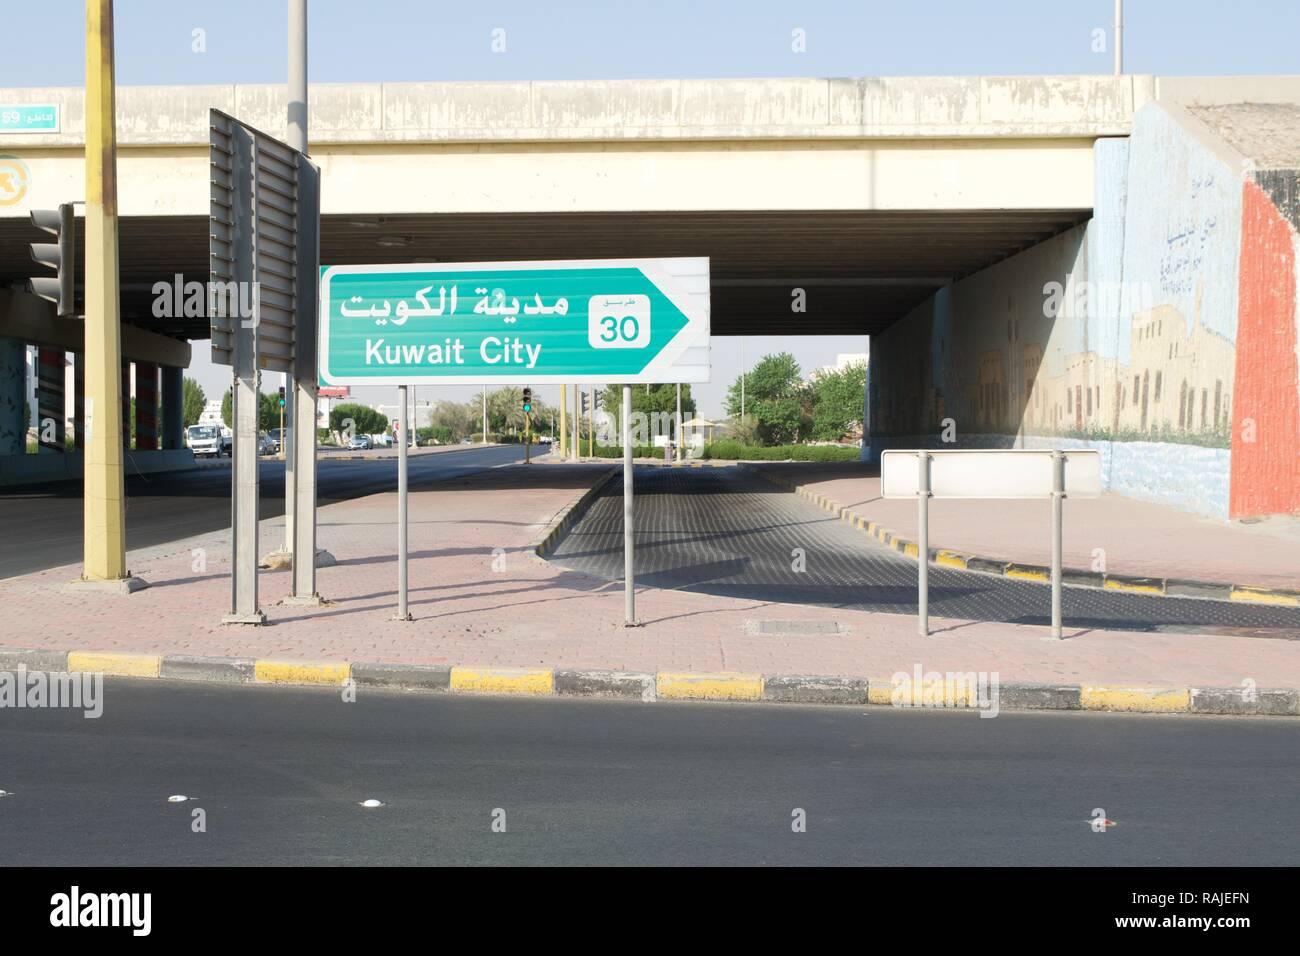 Kuwait Street - Stock Image